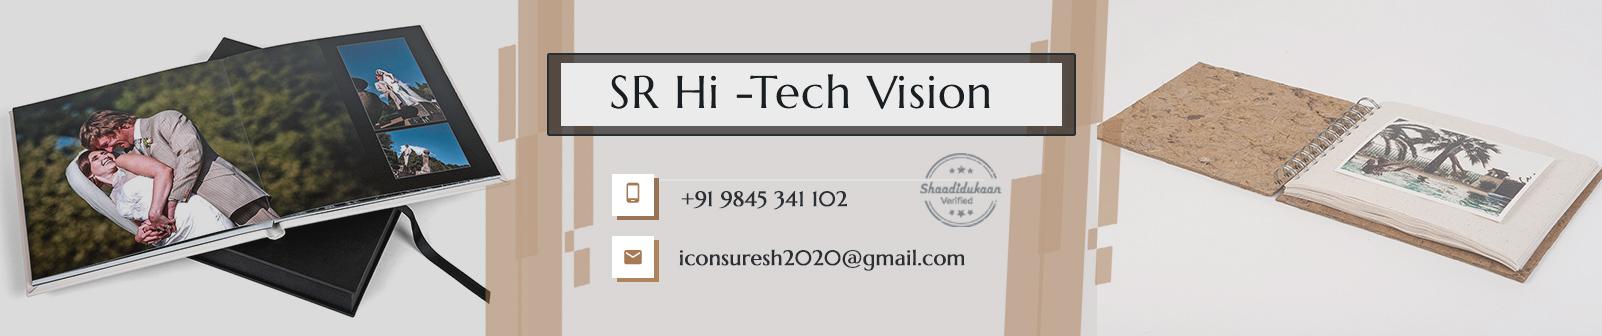 SR HI-Tech Vision